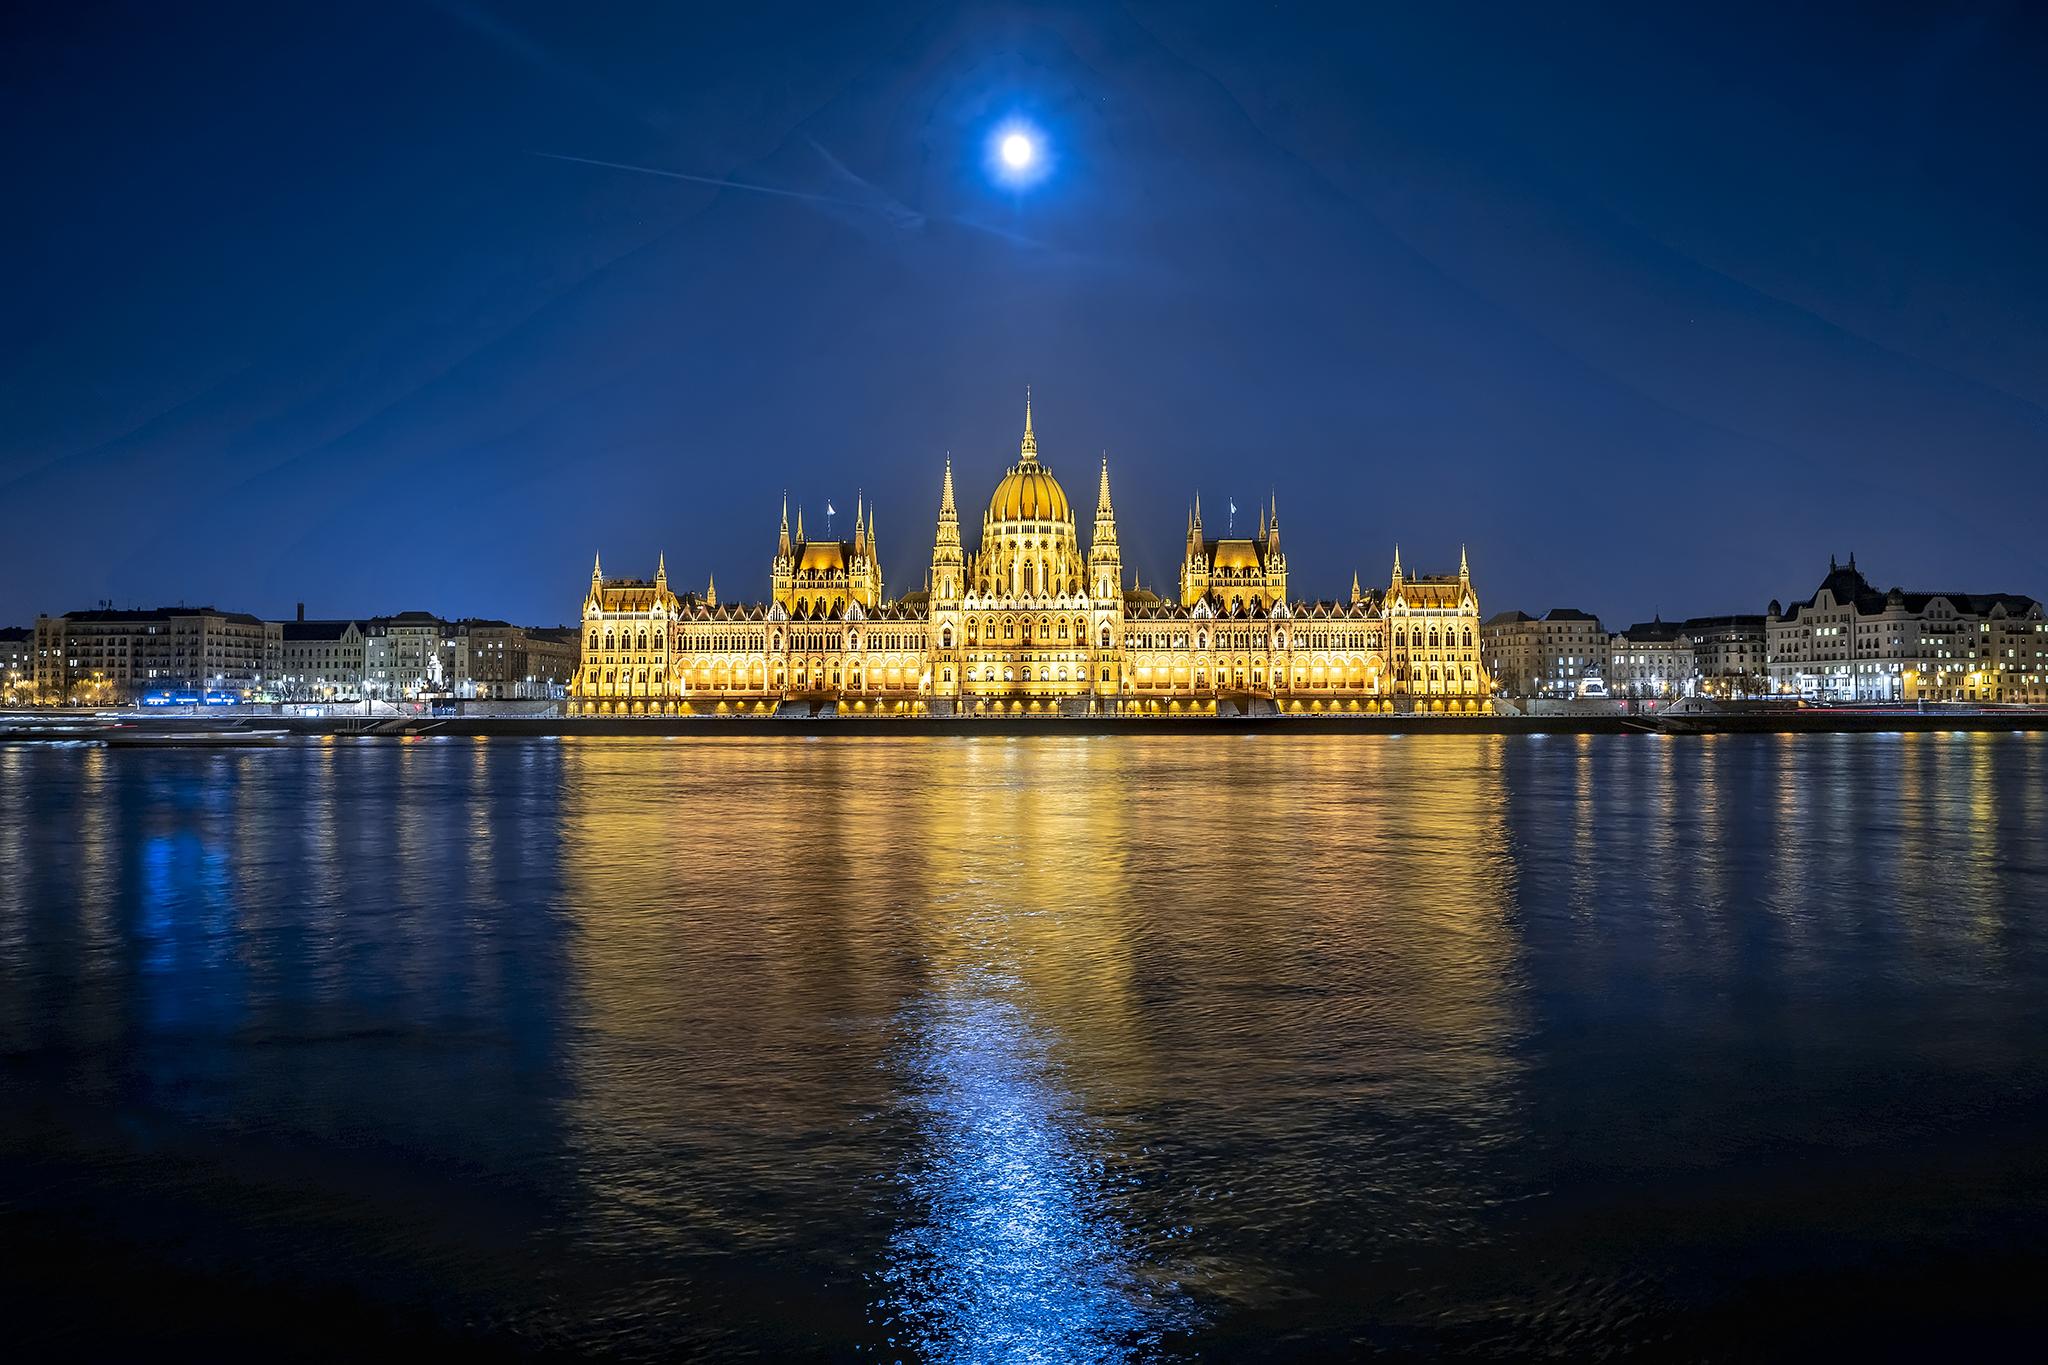 The Hungarian Parliament building, Hungary